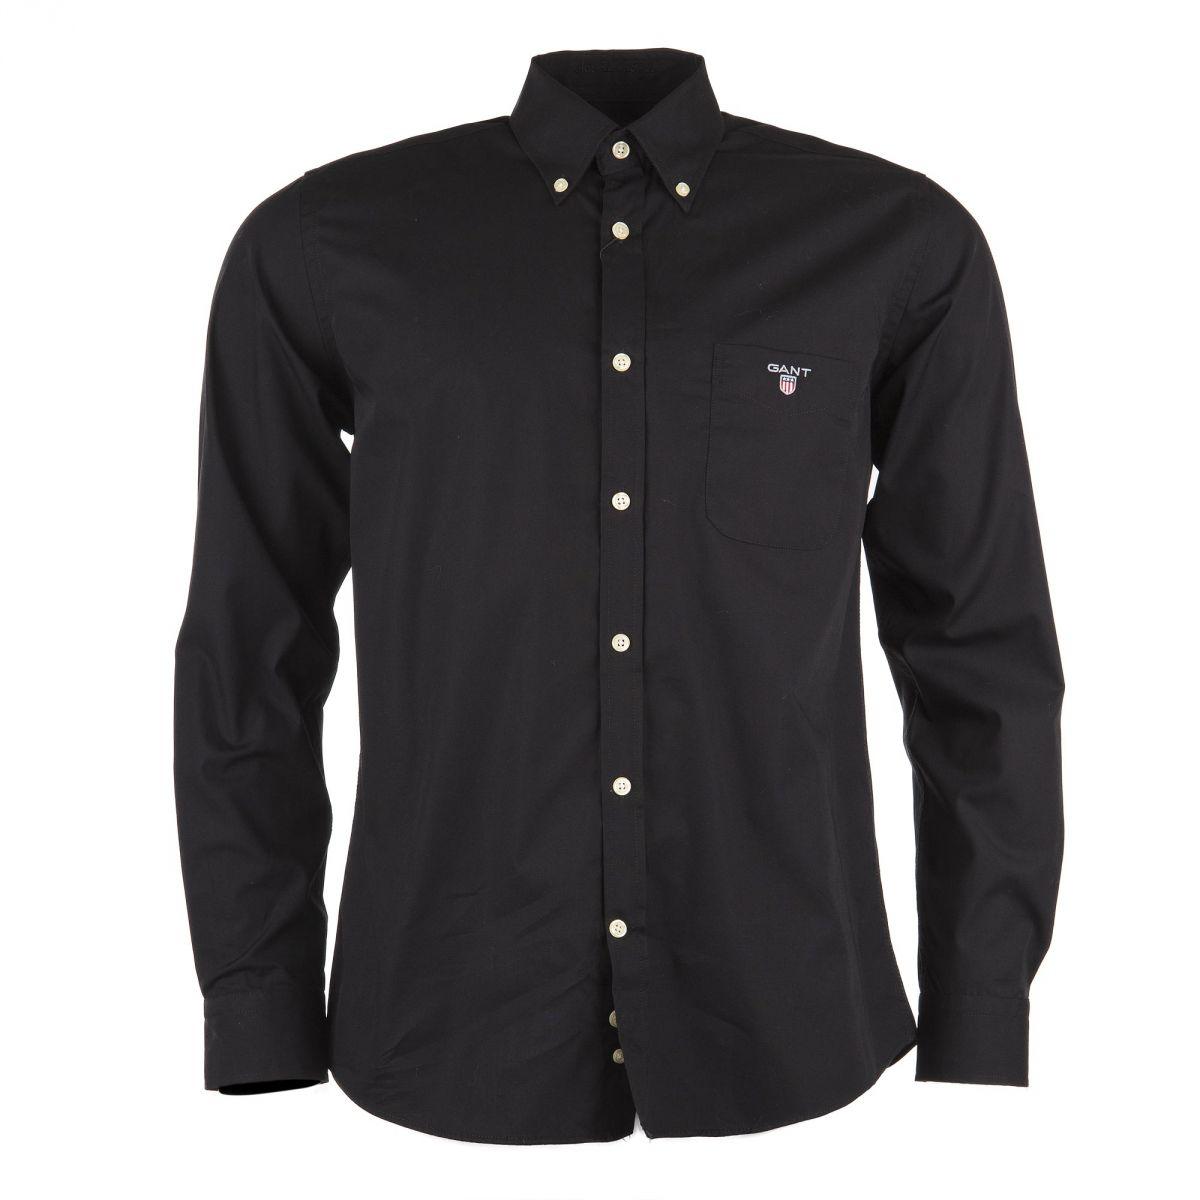 chemise noire homme gant prix d griff. Black Bedroom Furniture Sets. Home Design Ideas